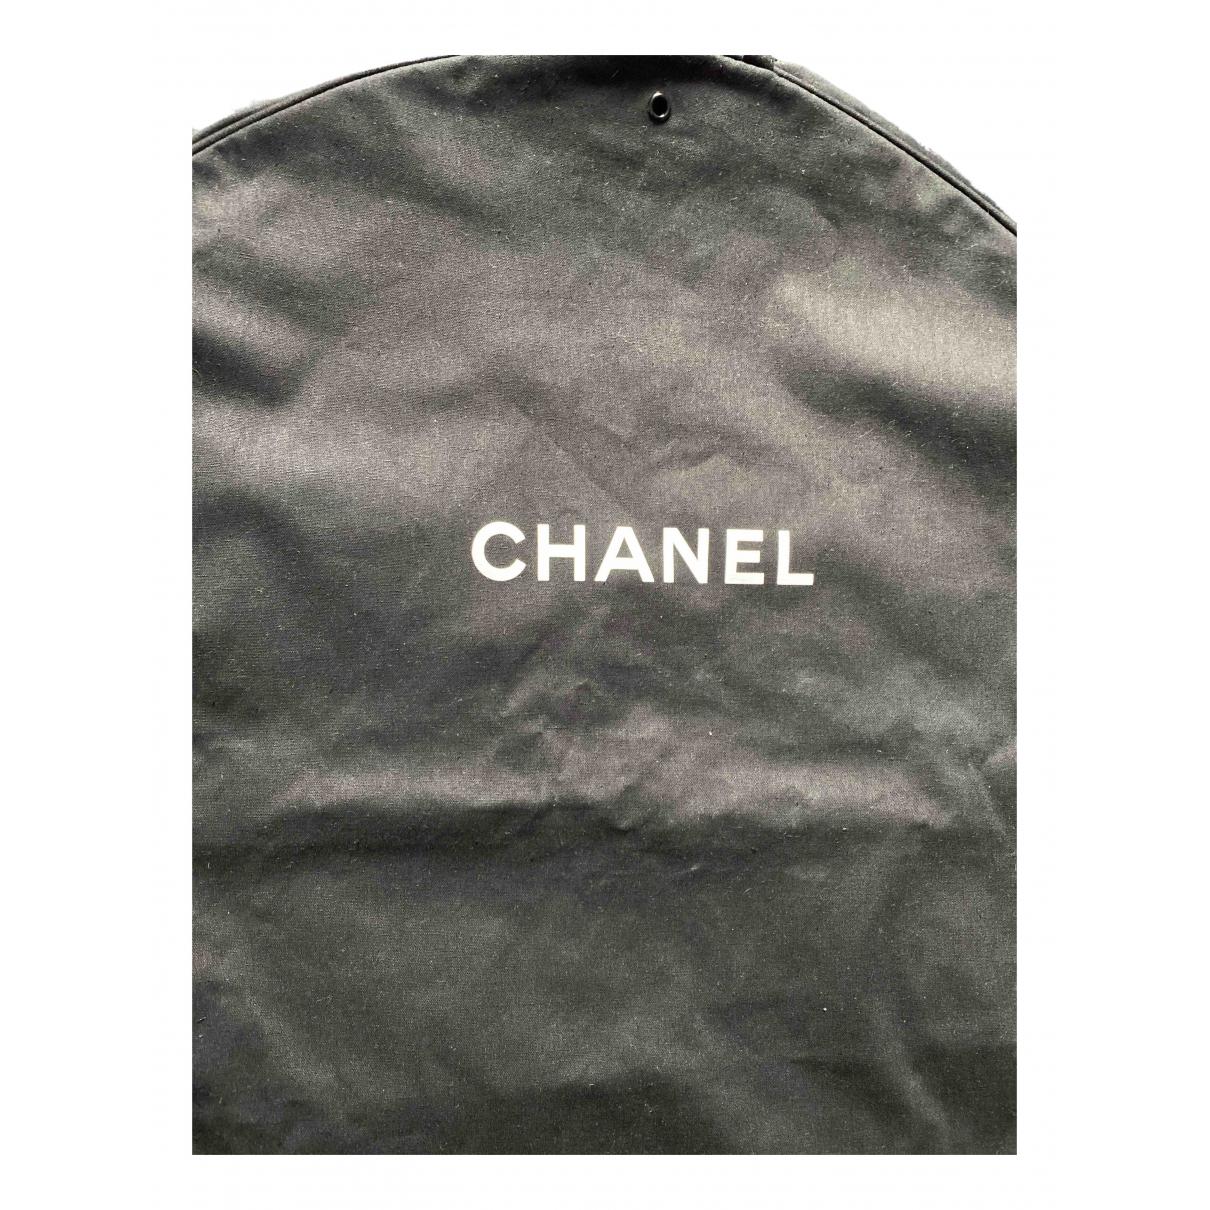 Viajes Chanel